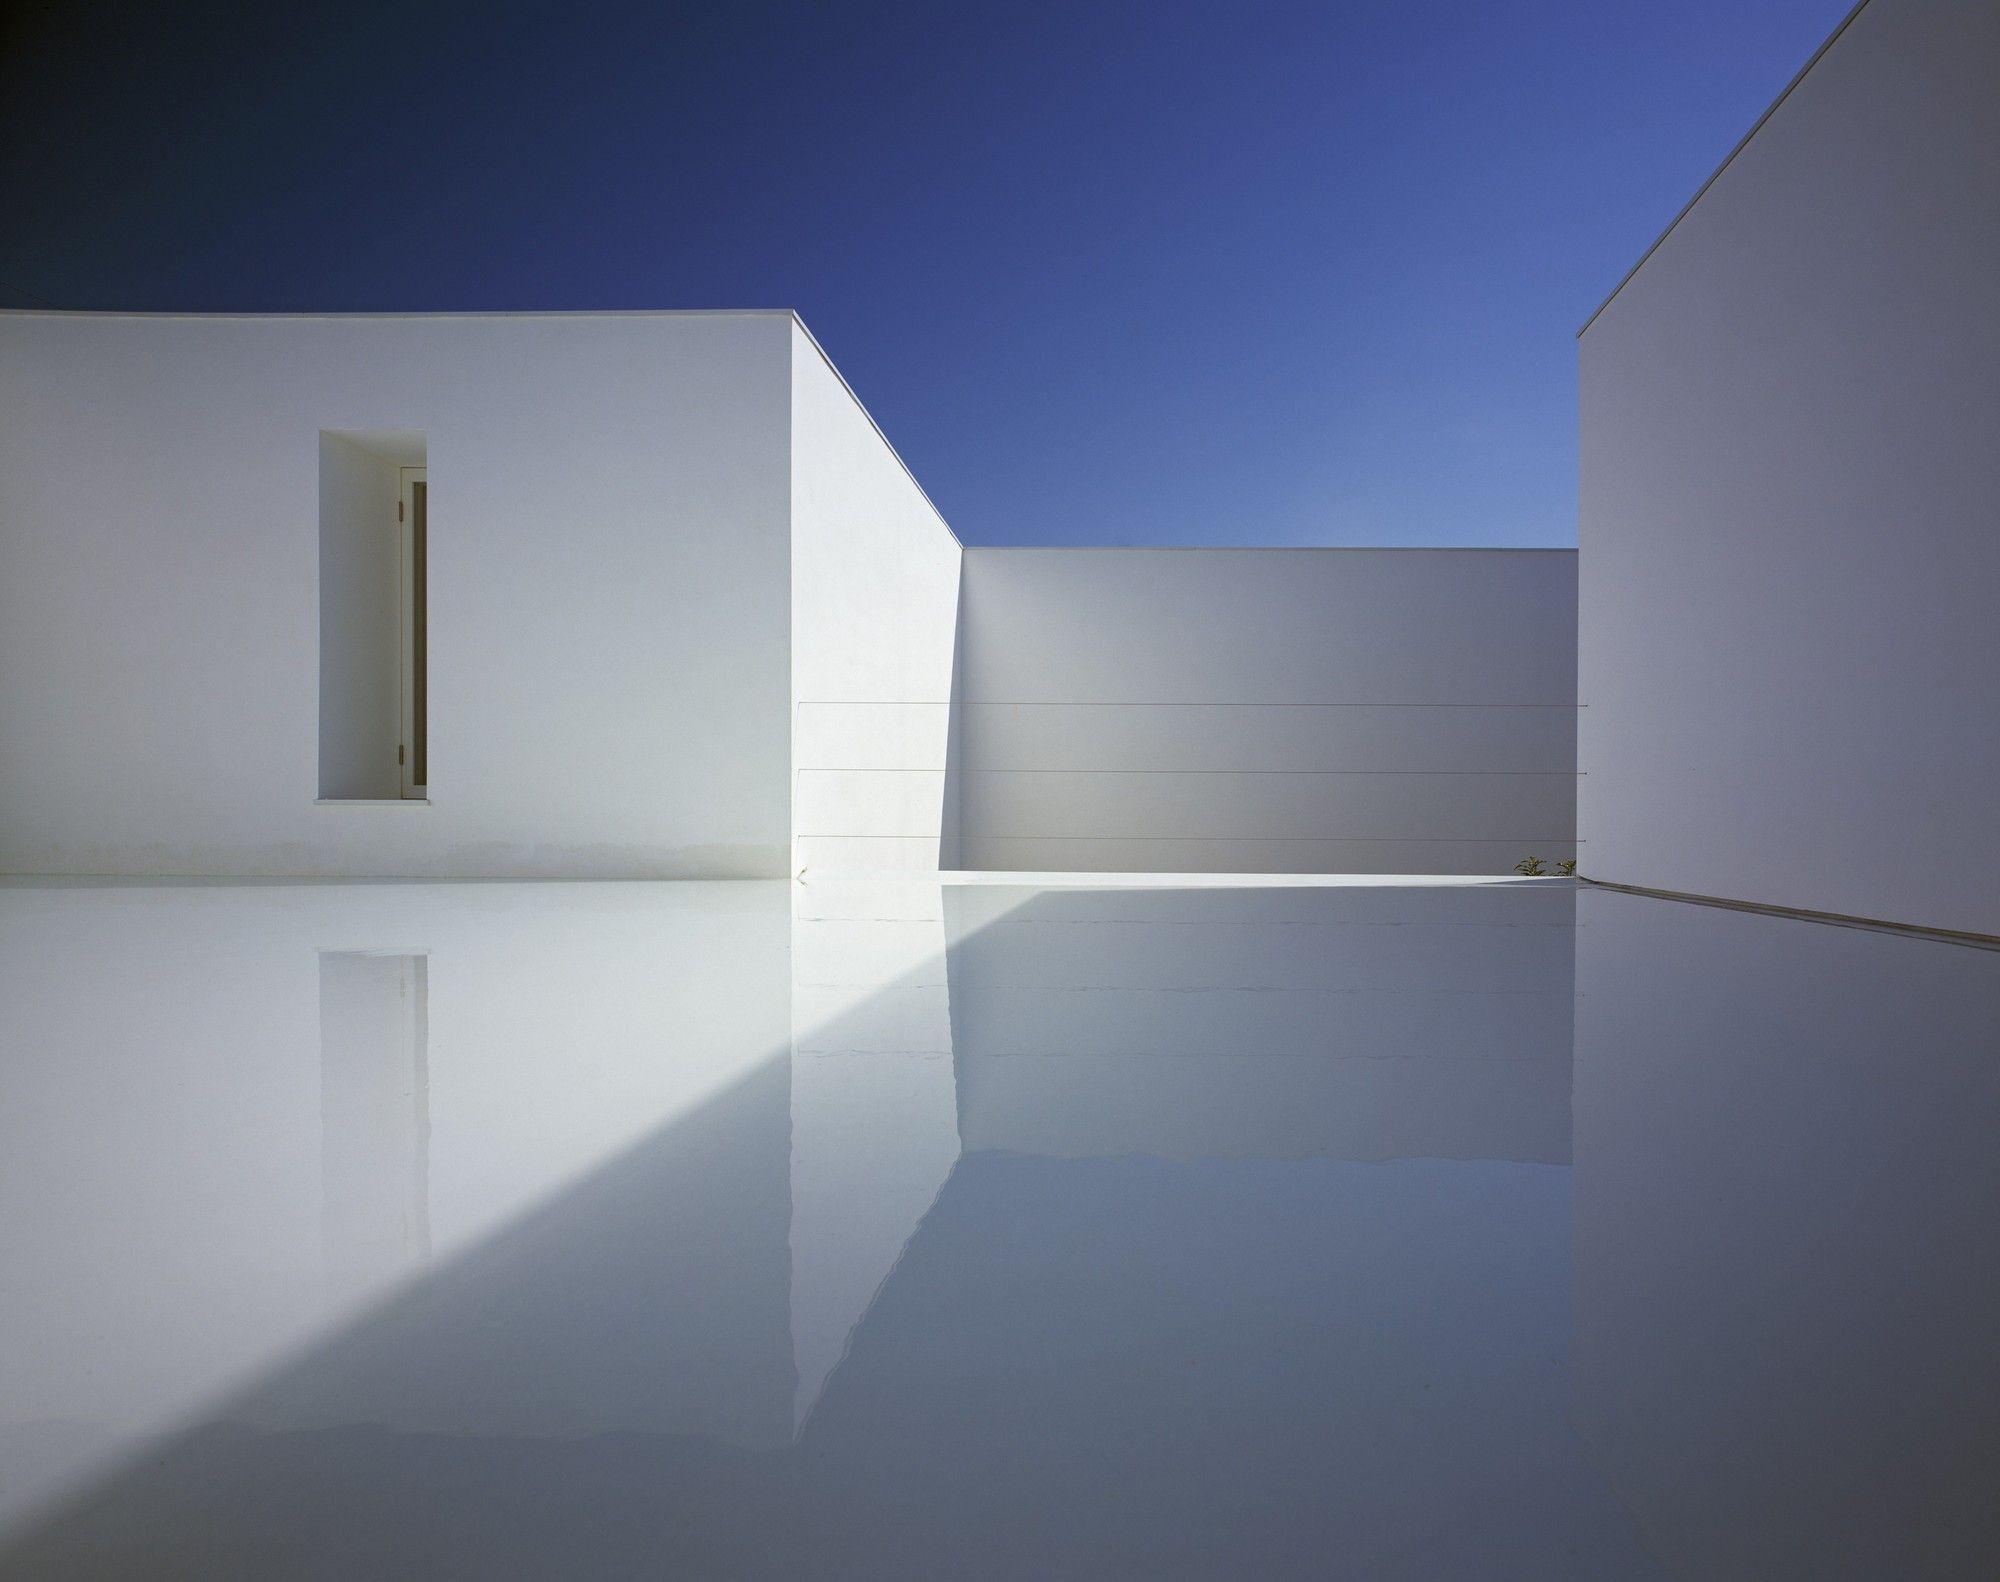 White Modern Houses gallery of white cave house / takuro yamamoto architects - 8